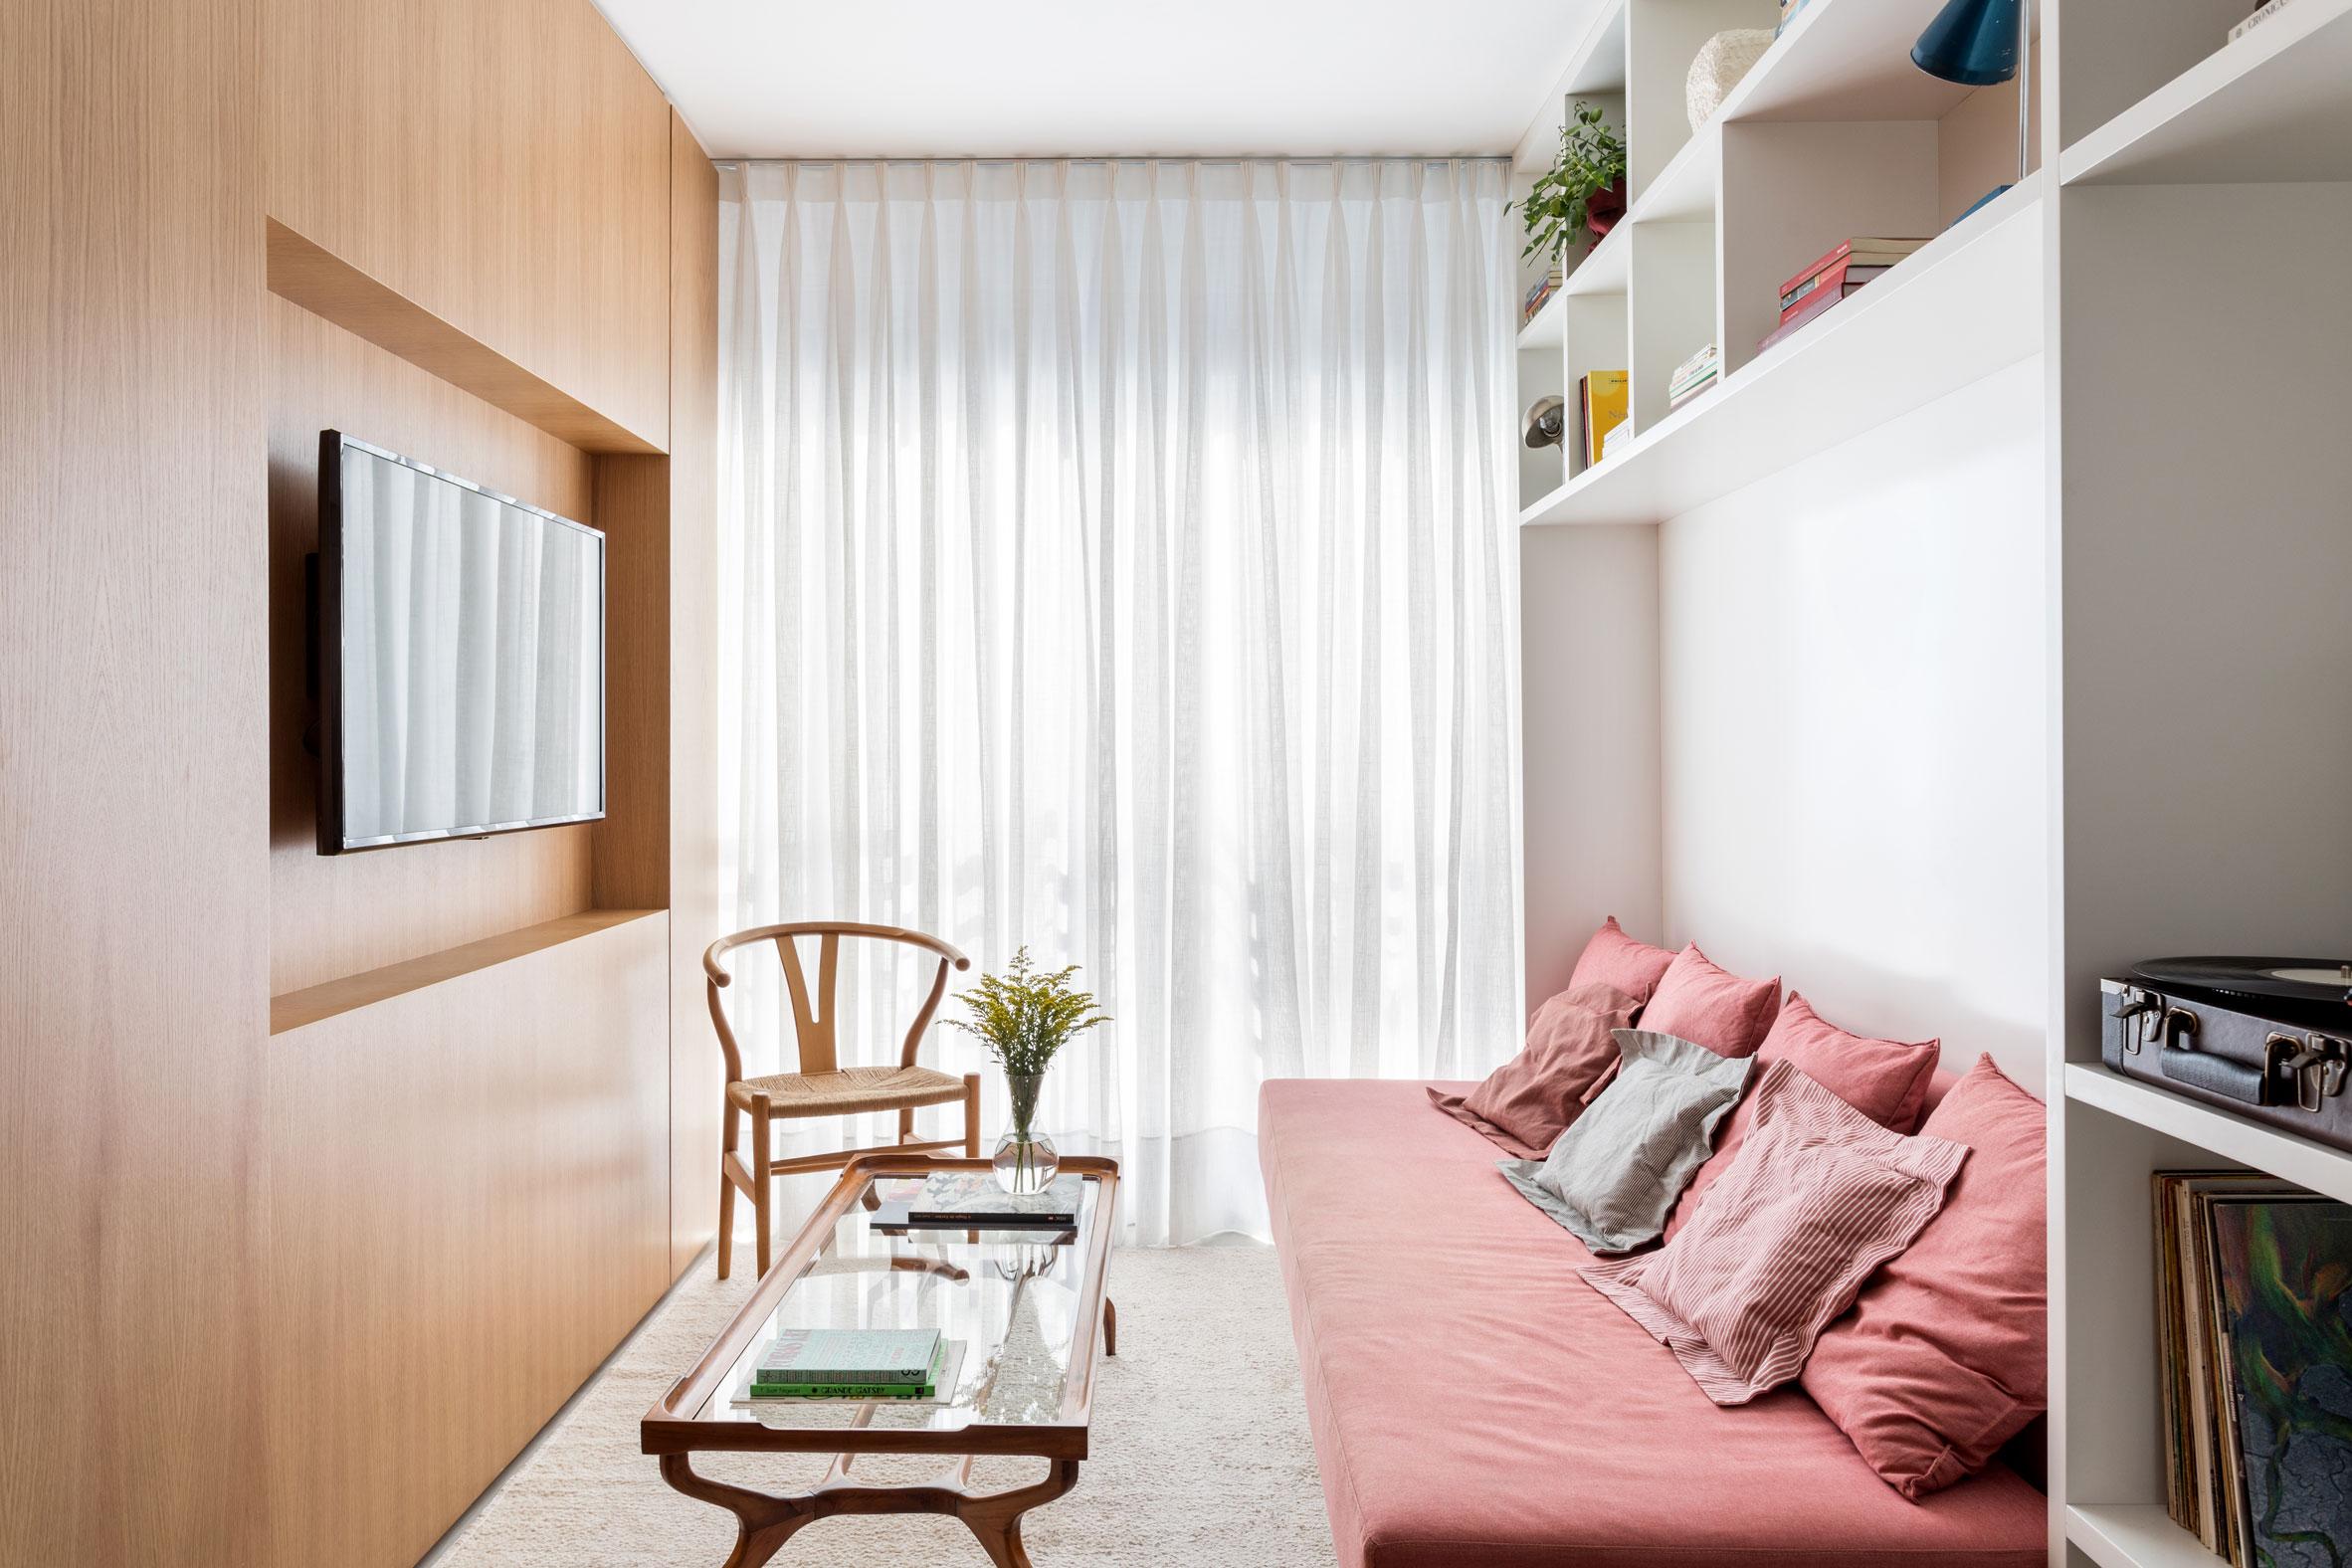 Sao Francisco apartment renovation by Leandor Garcia